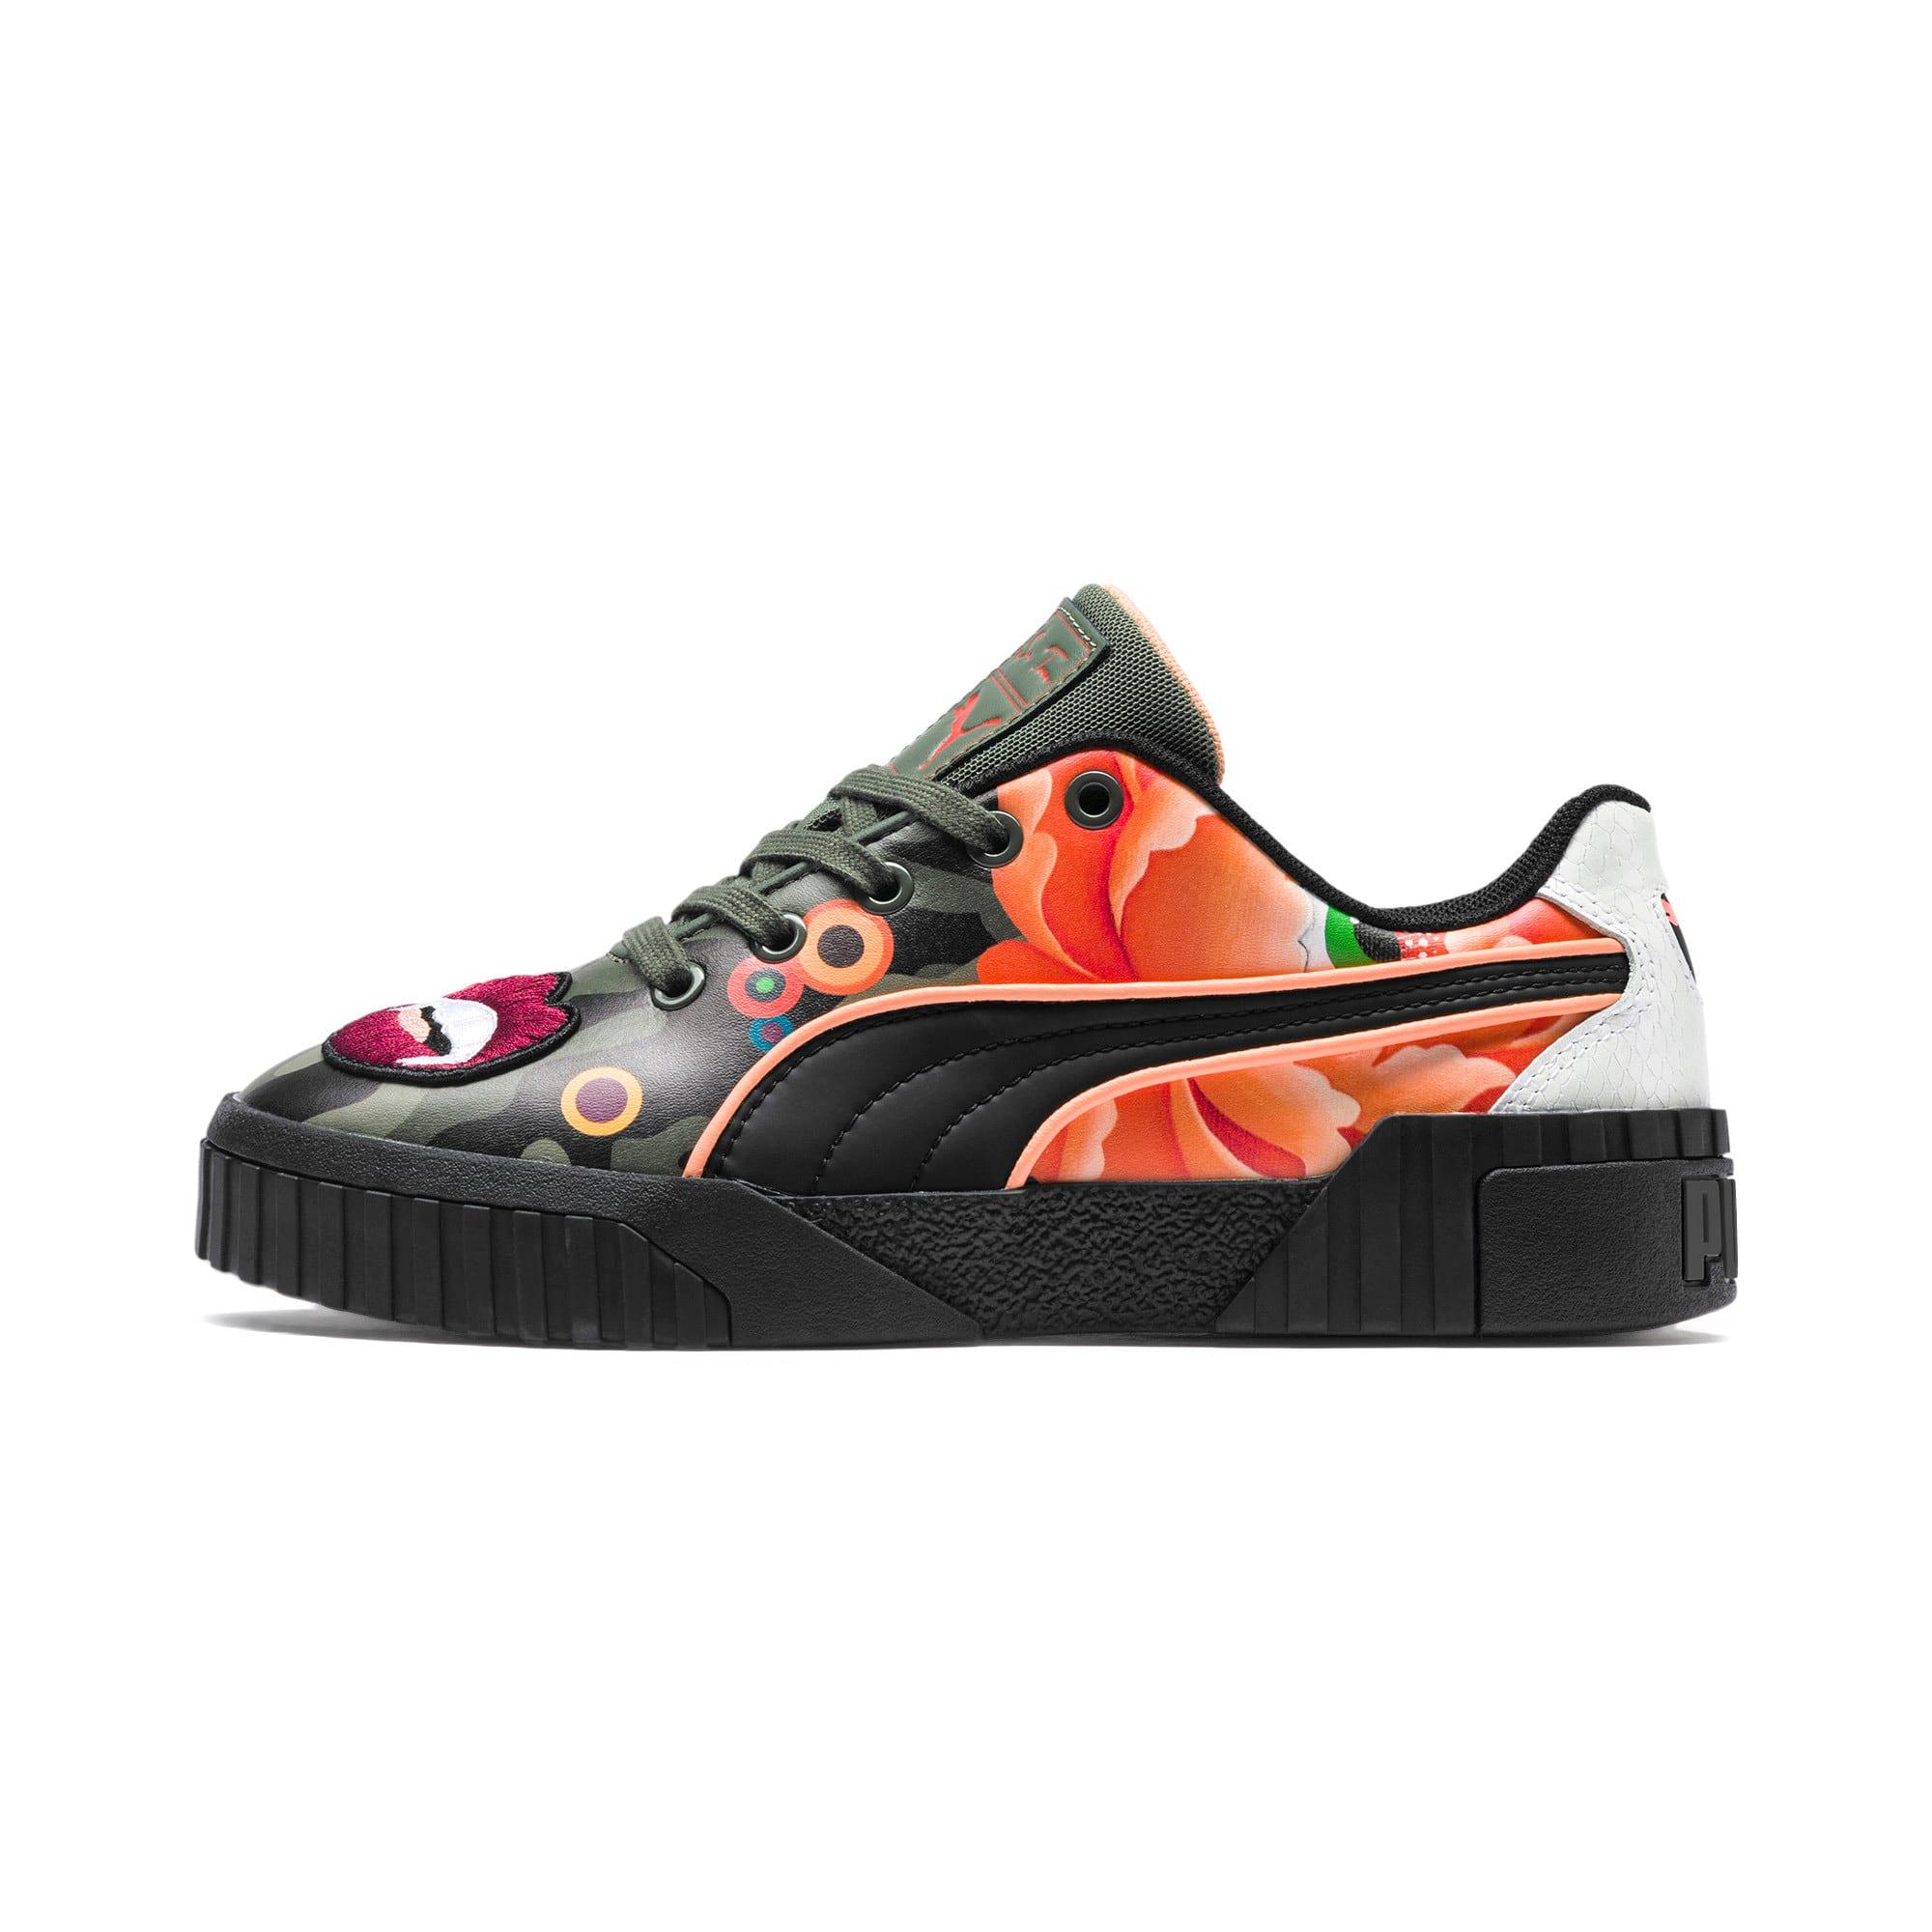 Thumbnail 1 of PUMA x SUE TSAI Cali Peonies Camo Women's Sneakers, Puma Black-Puma Black, medium